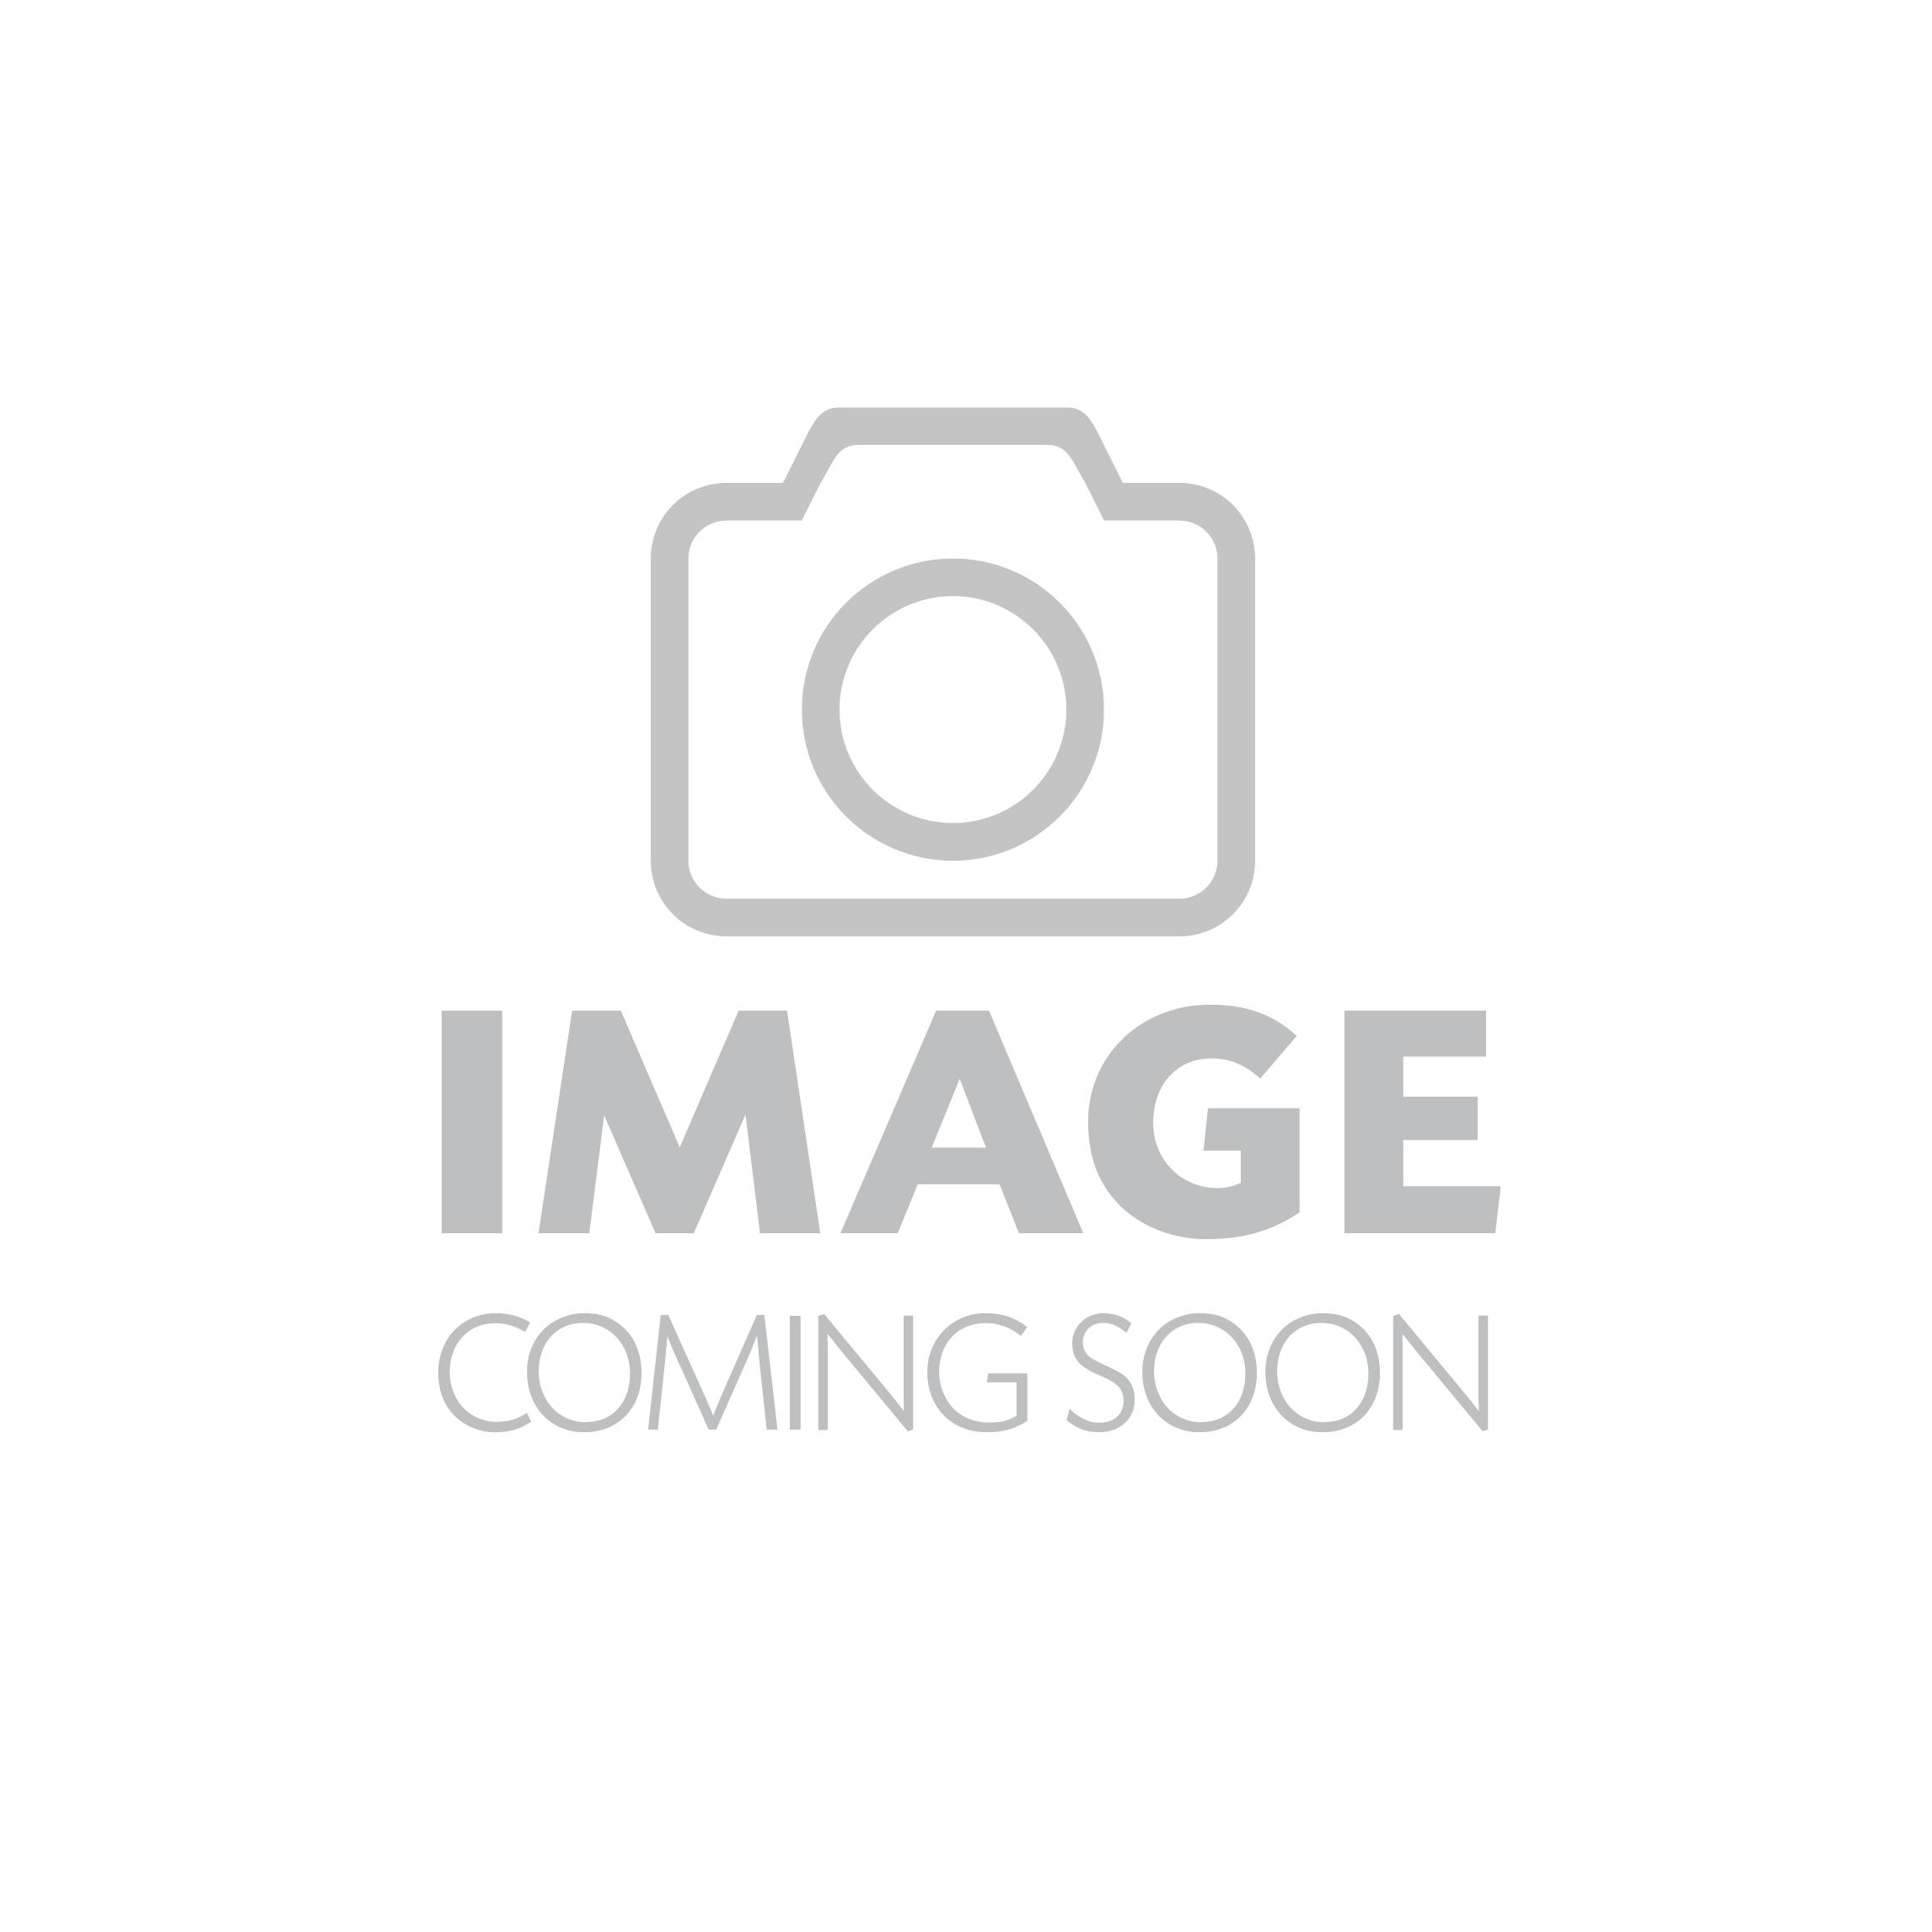 Crete 800mm Wall Hung 2 Drawer Vanity (Grey Avola) with Worktop